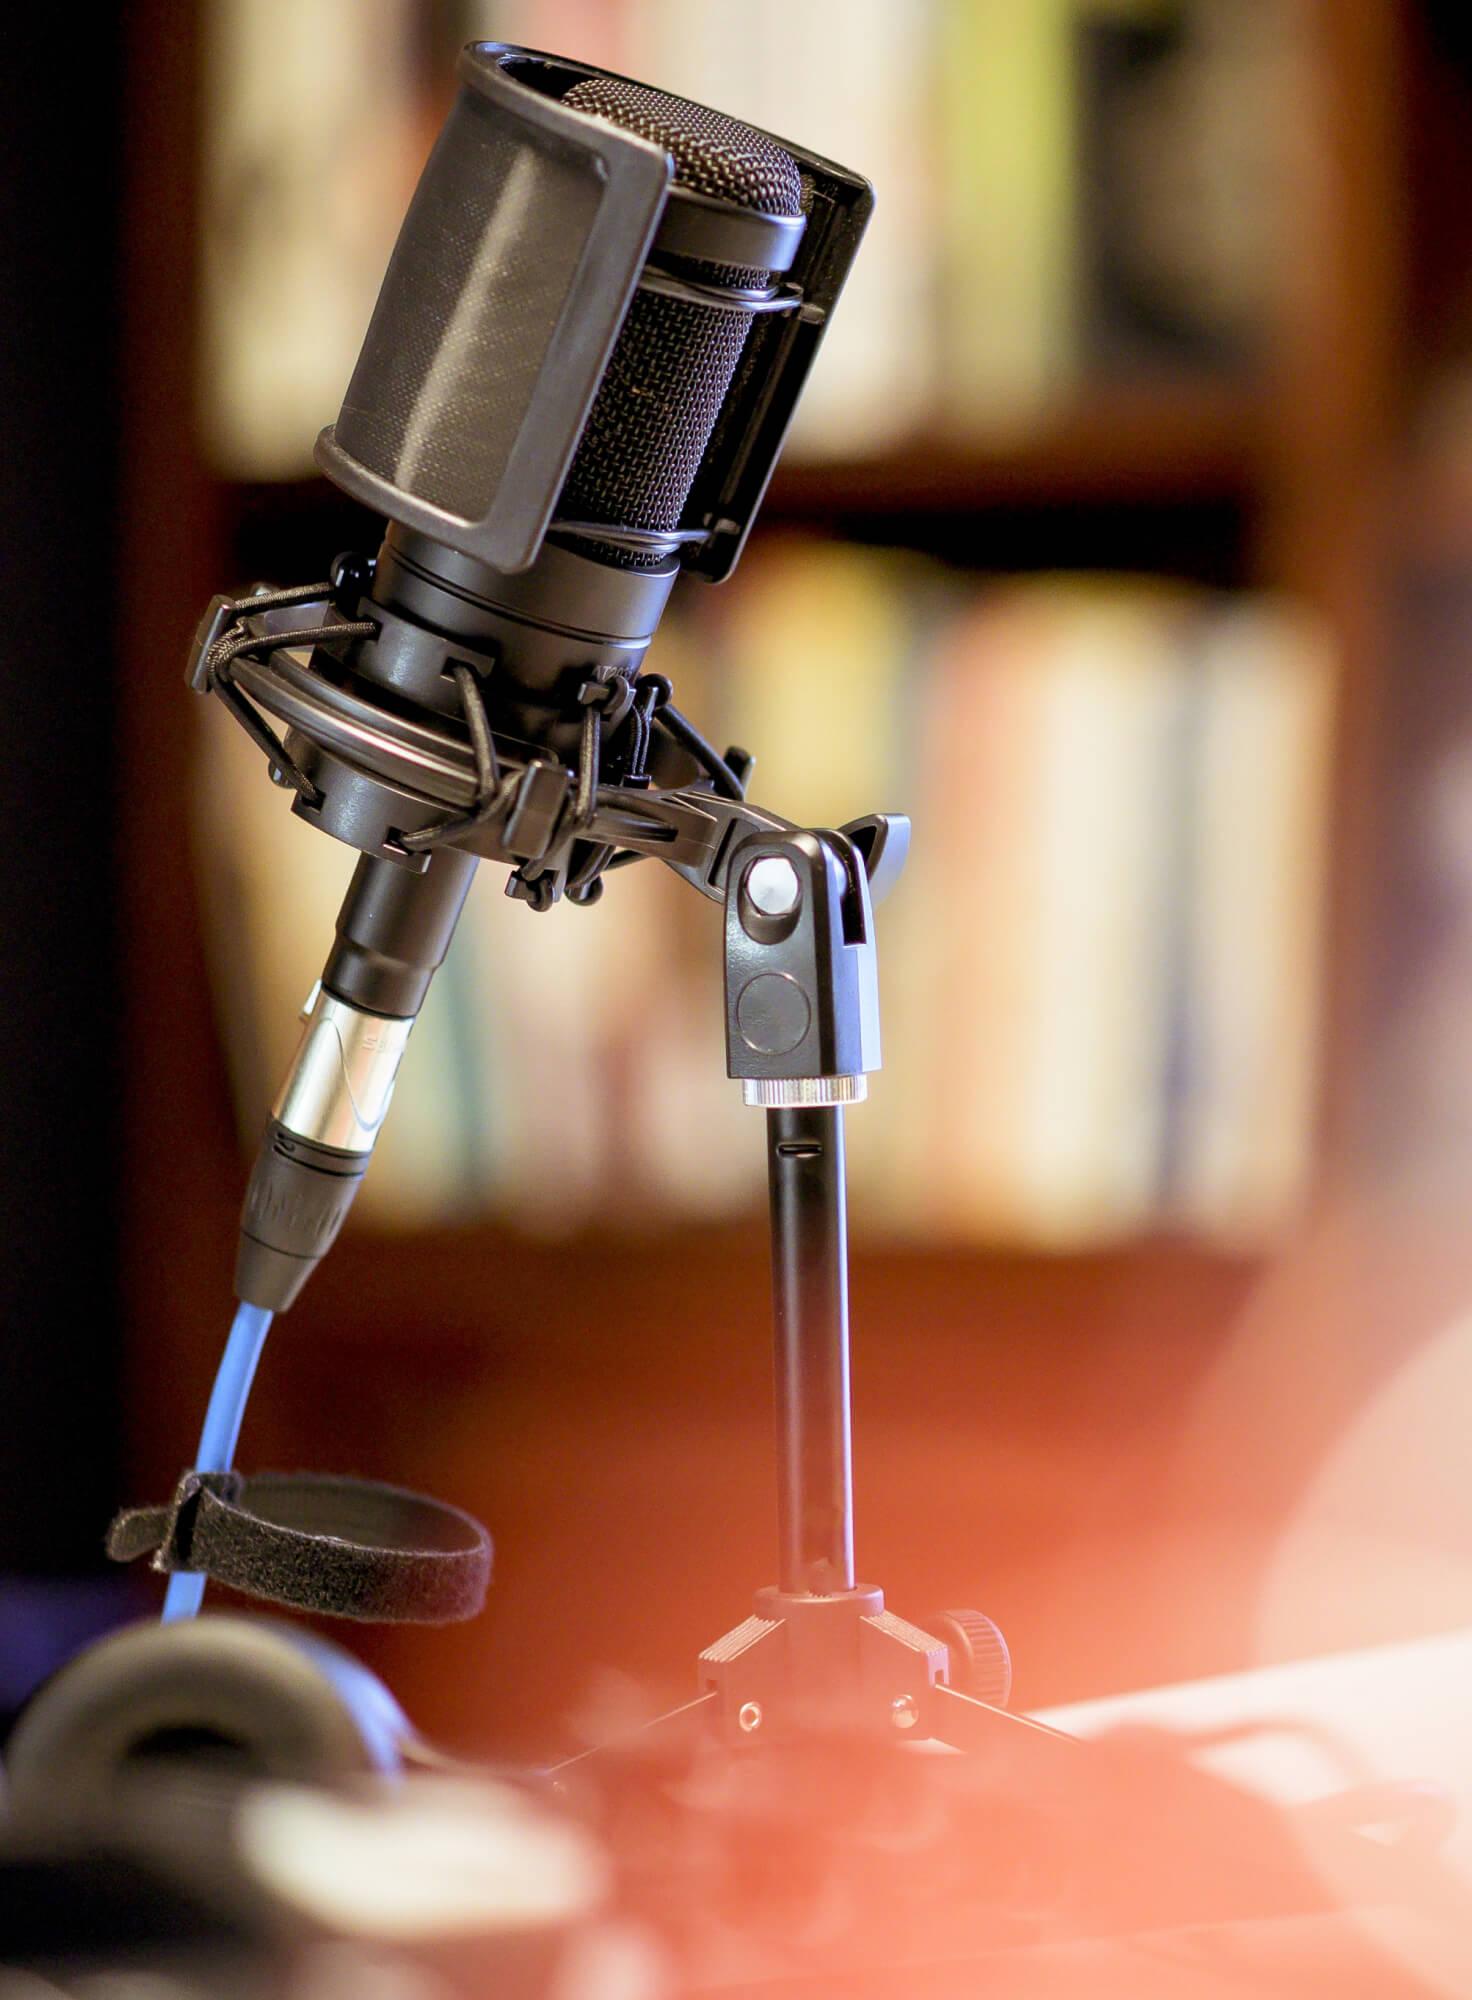 Distributing radio broadcasting across Africa